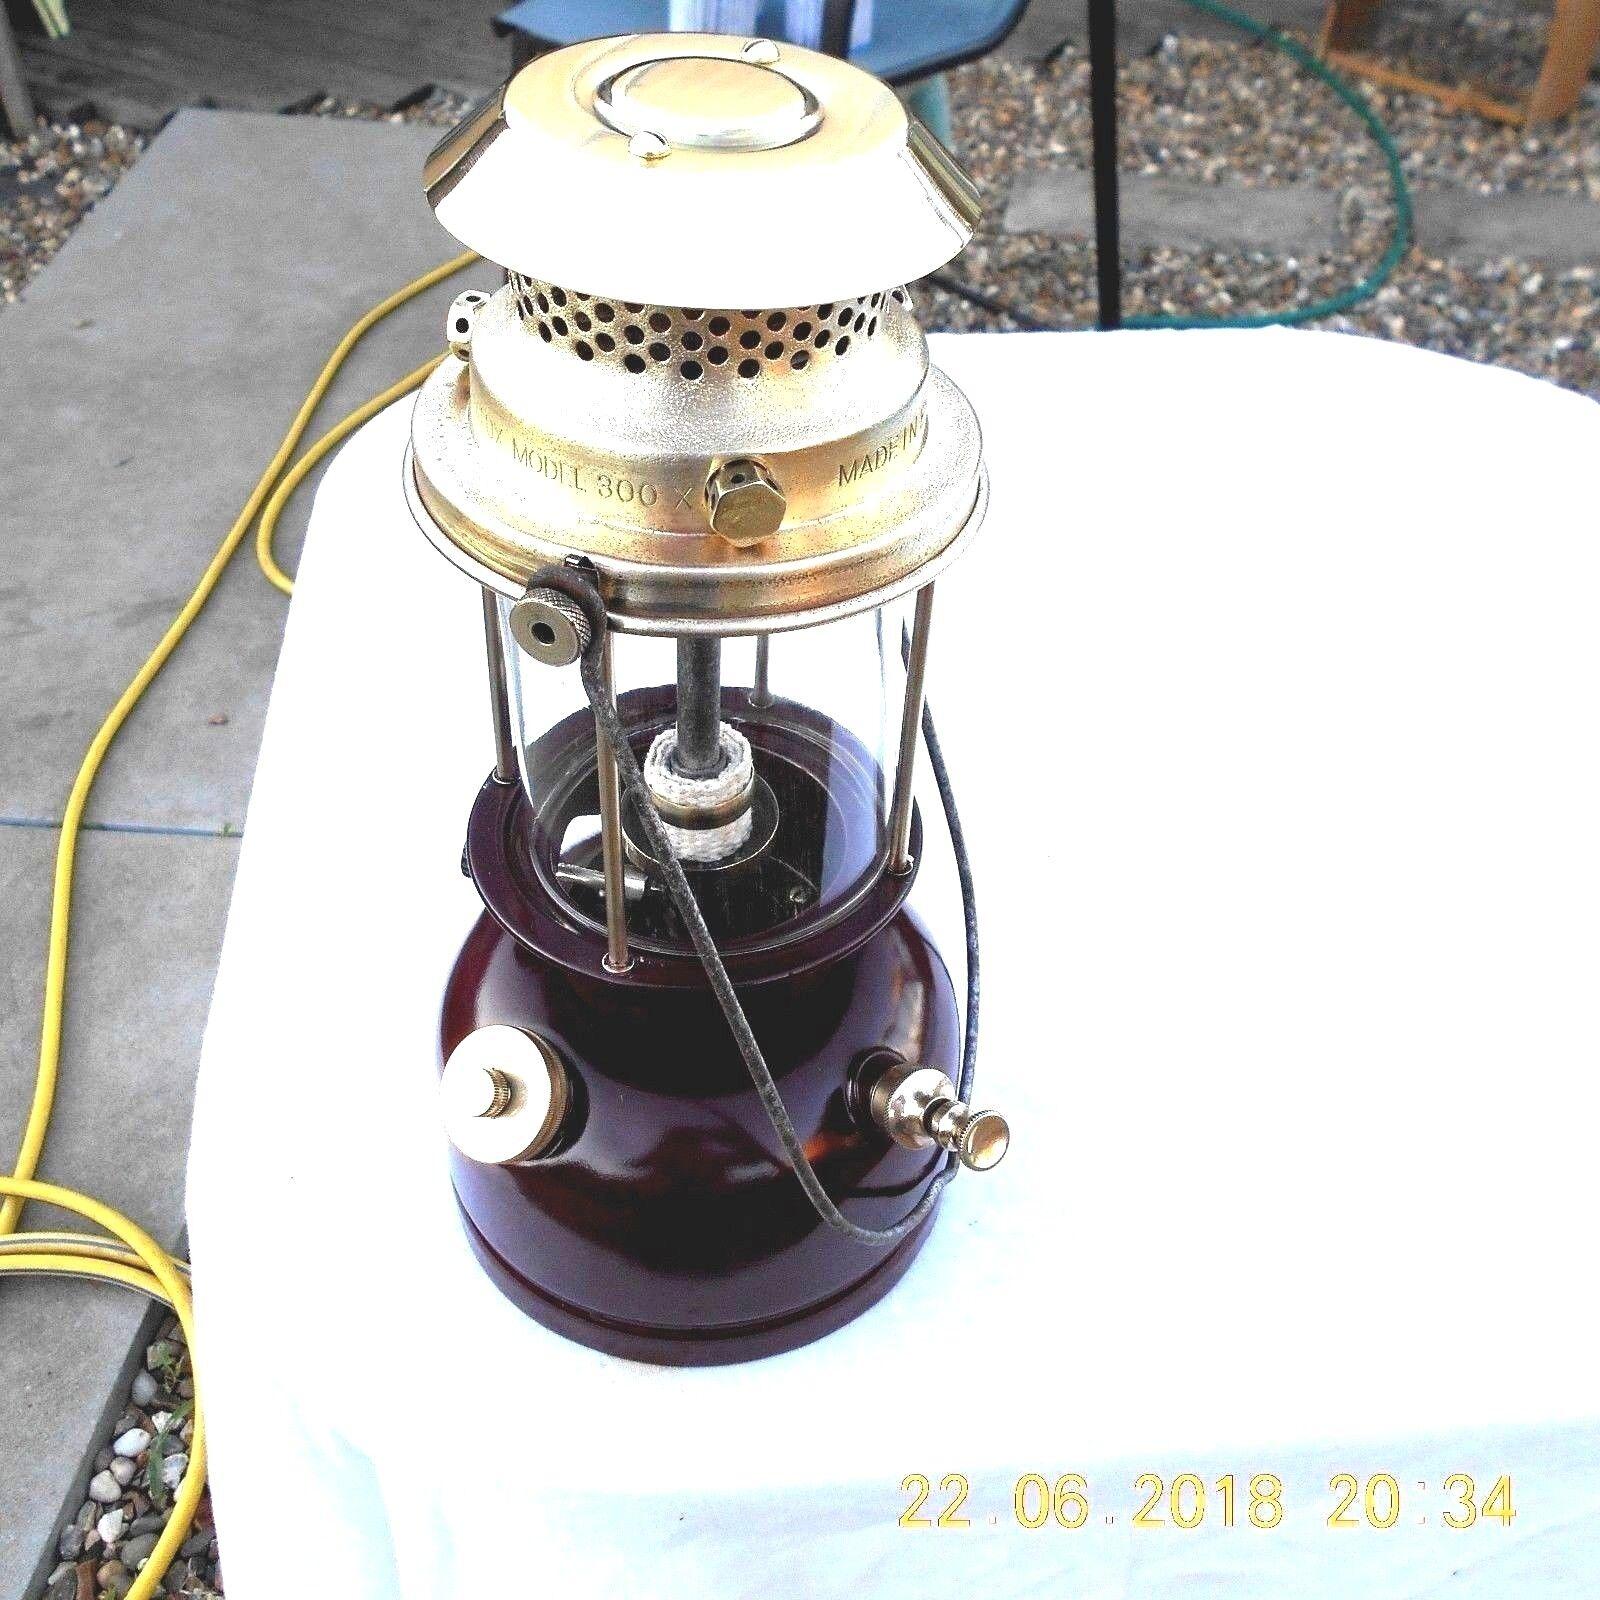 1940s  Vapalux  1940s Bialaddin Paraffin Oil Vintage Kerosene Lamp Antique Lantern 28a2d1